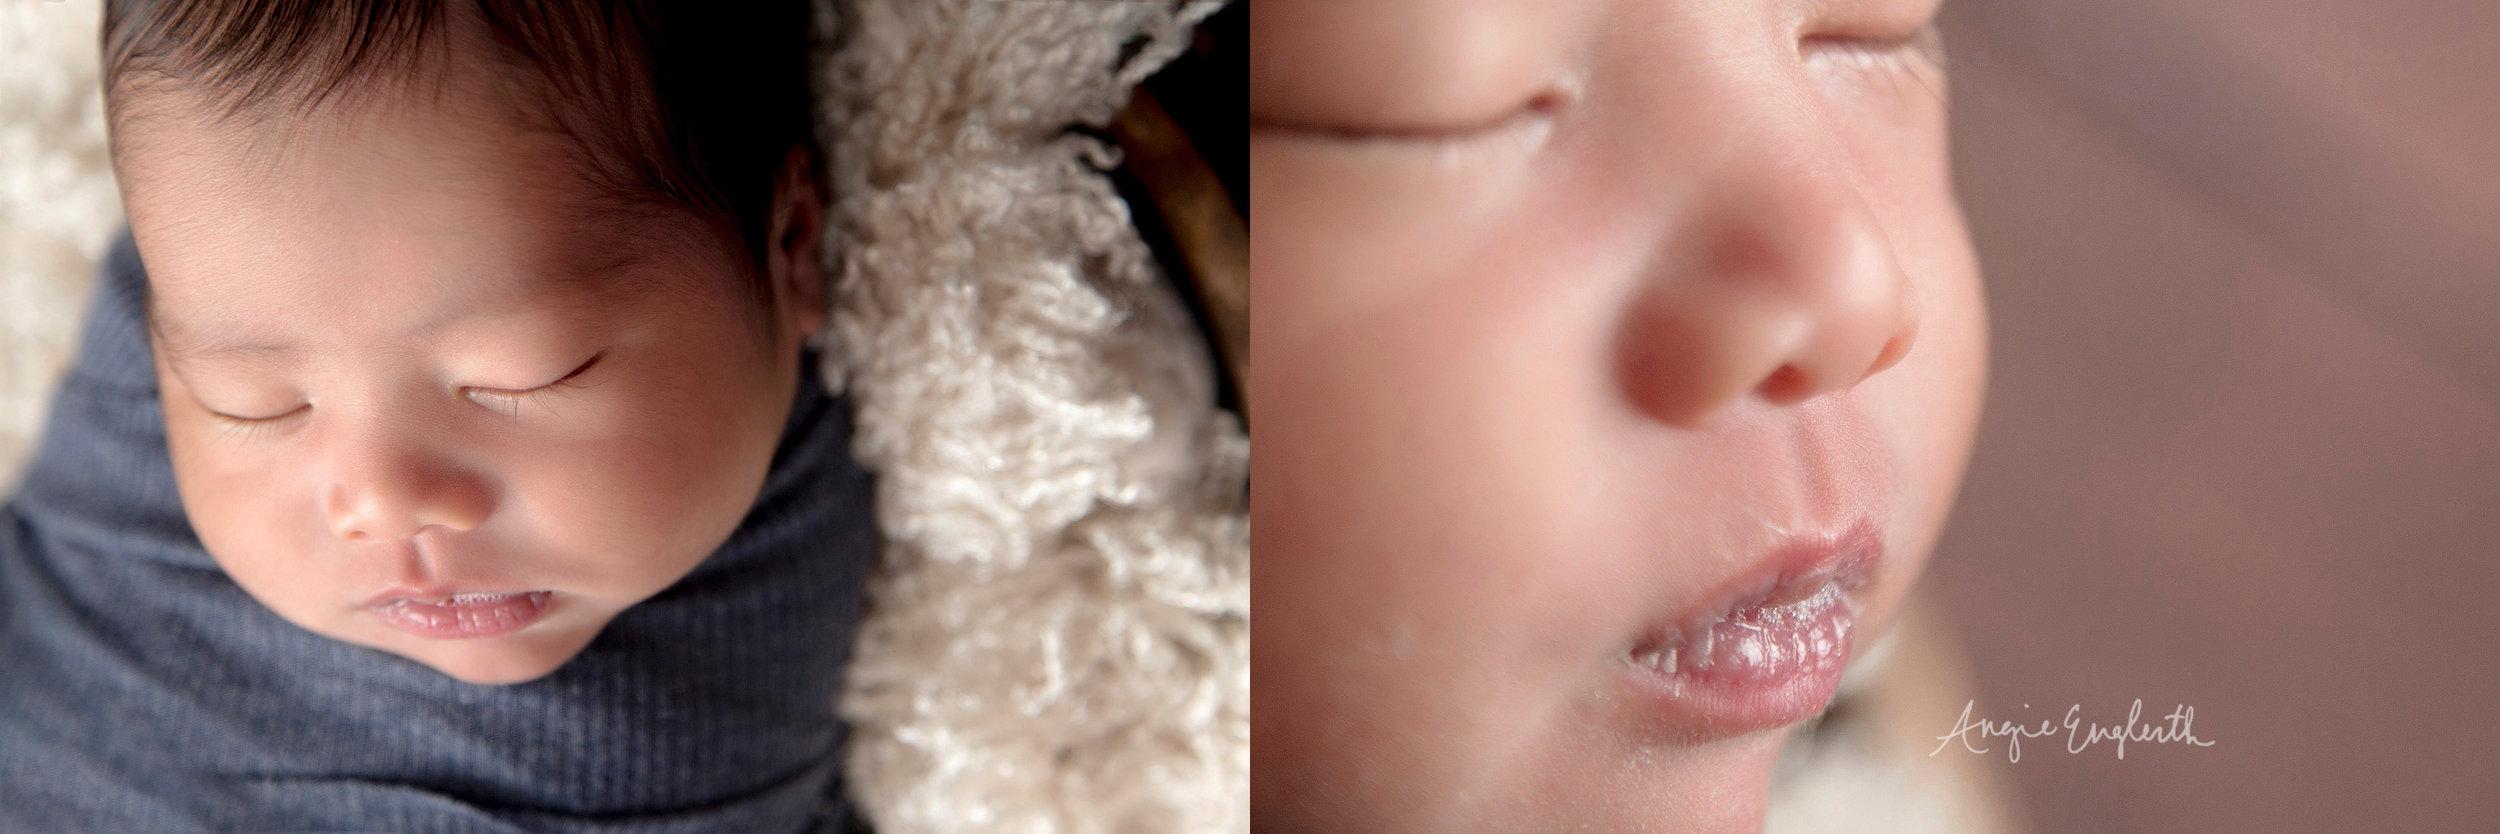 AngieEnglerthPhotography_Lancaster_Newborn_Photographer_016.jpg